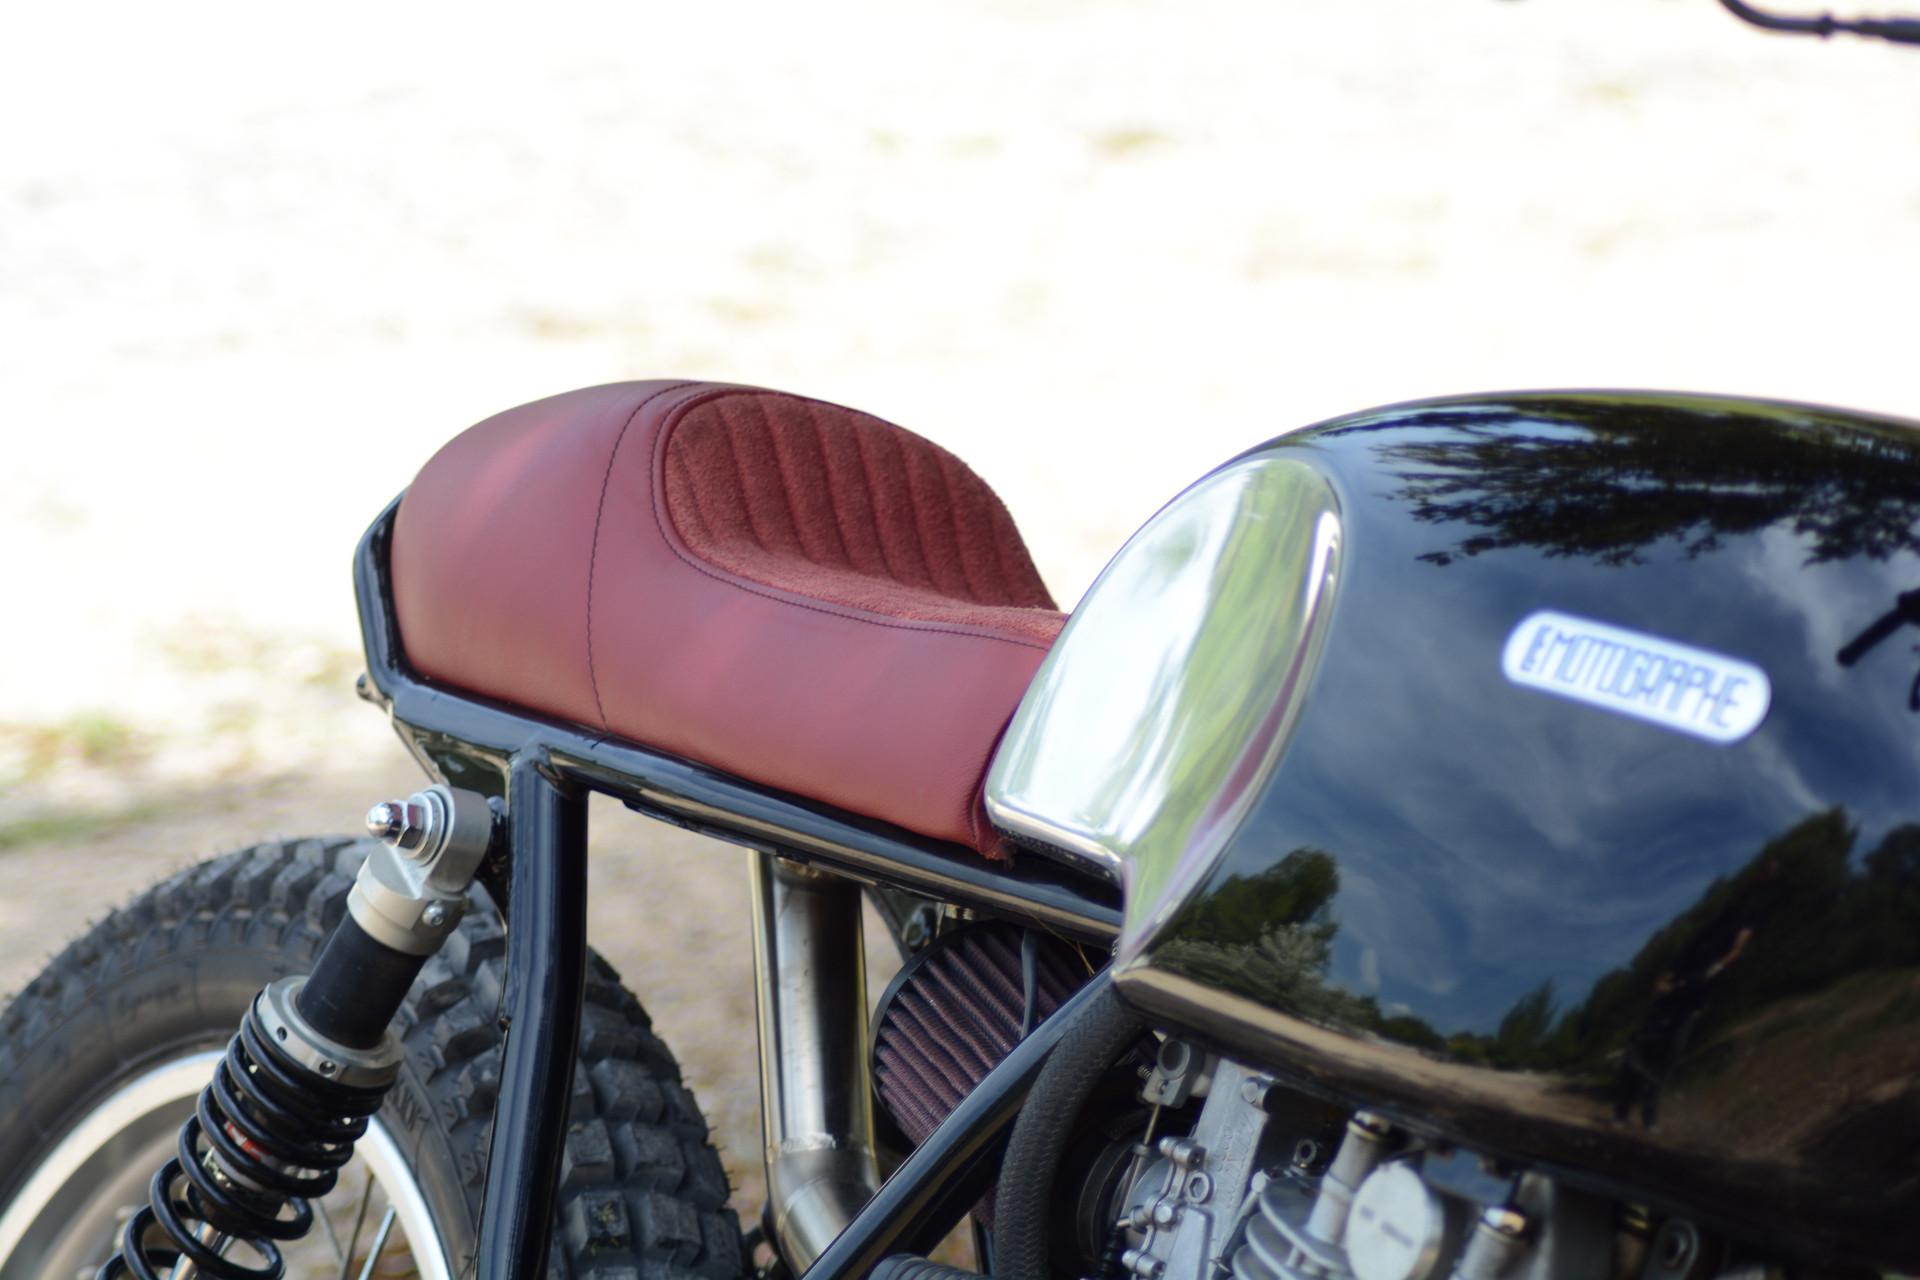 SR500 CLASSIC LE MOTOGRAPHE